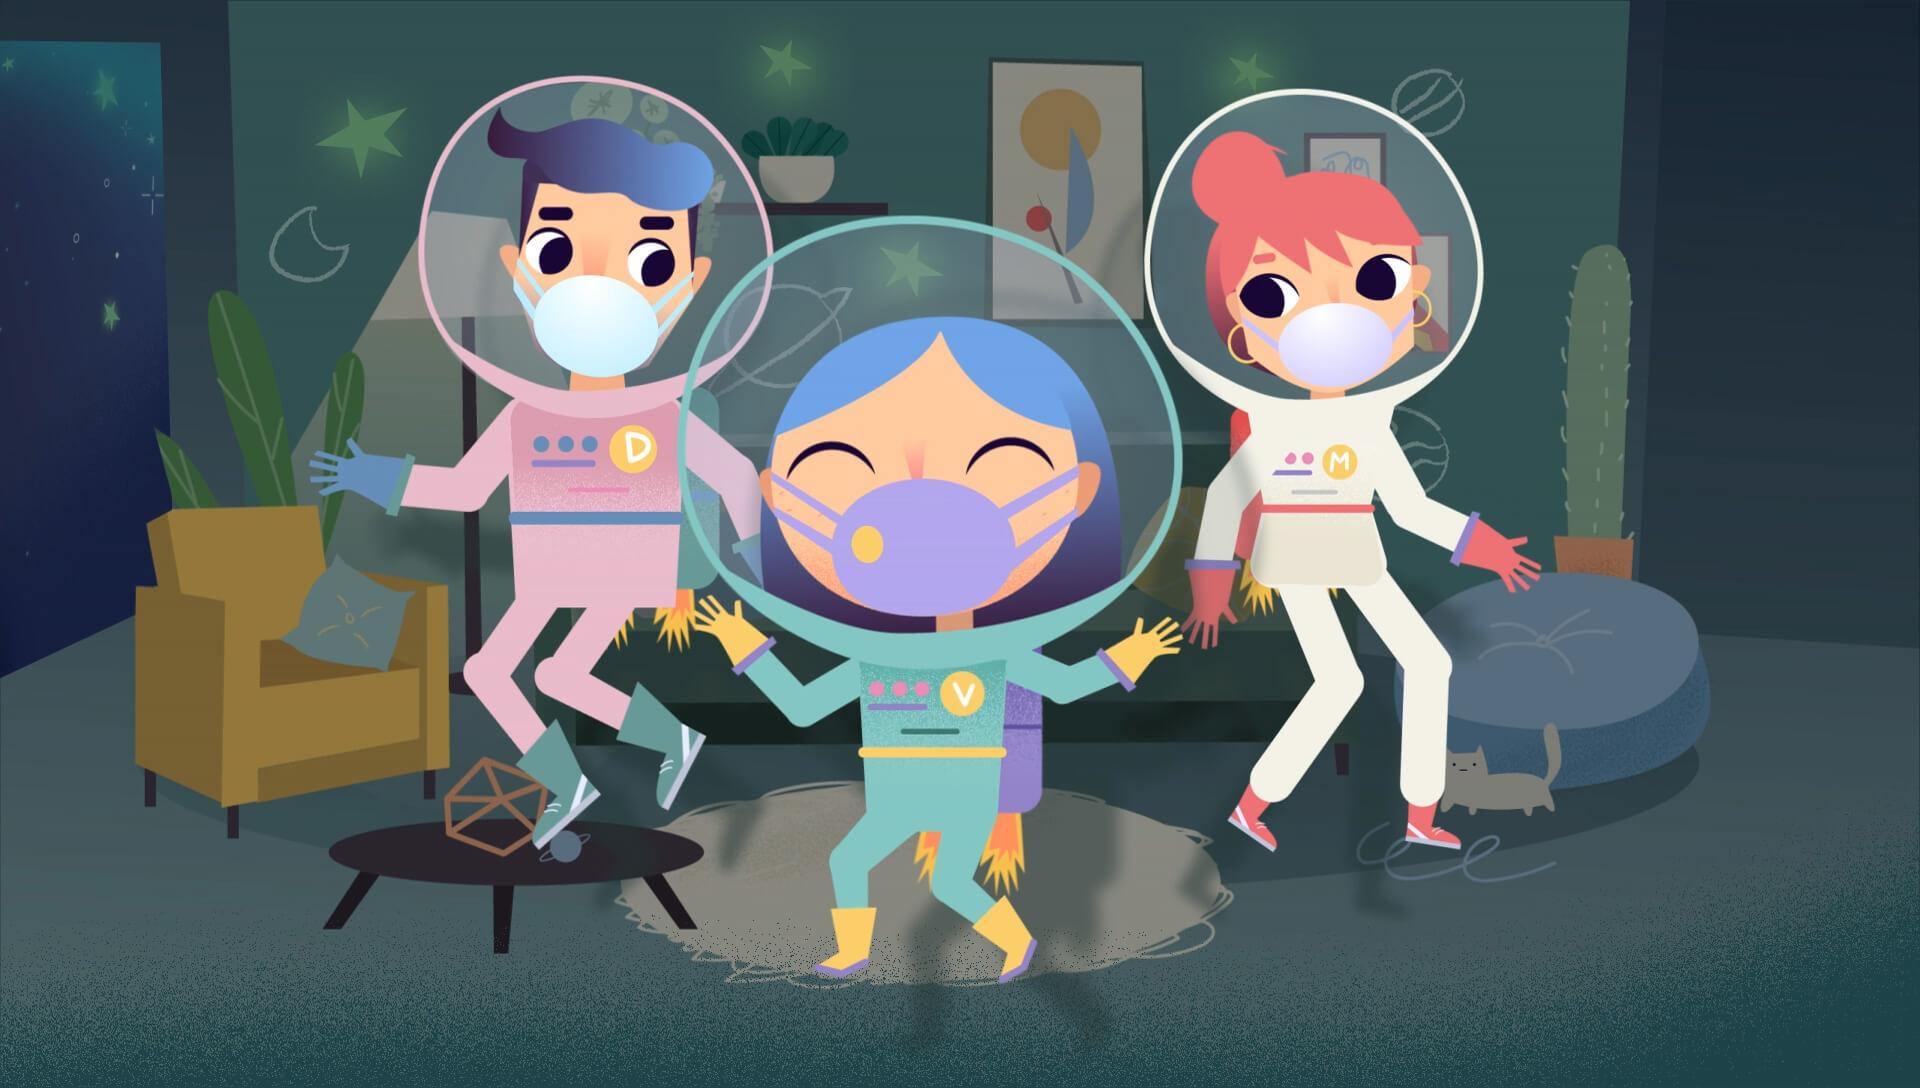 Cuentazos | Valeria La Astronauta